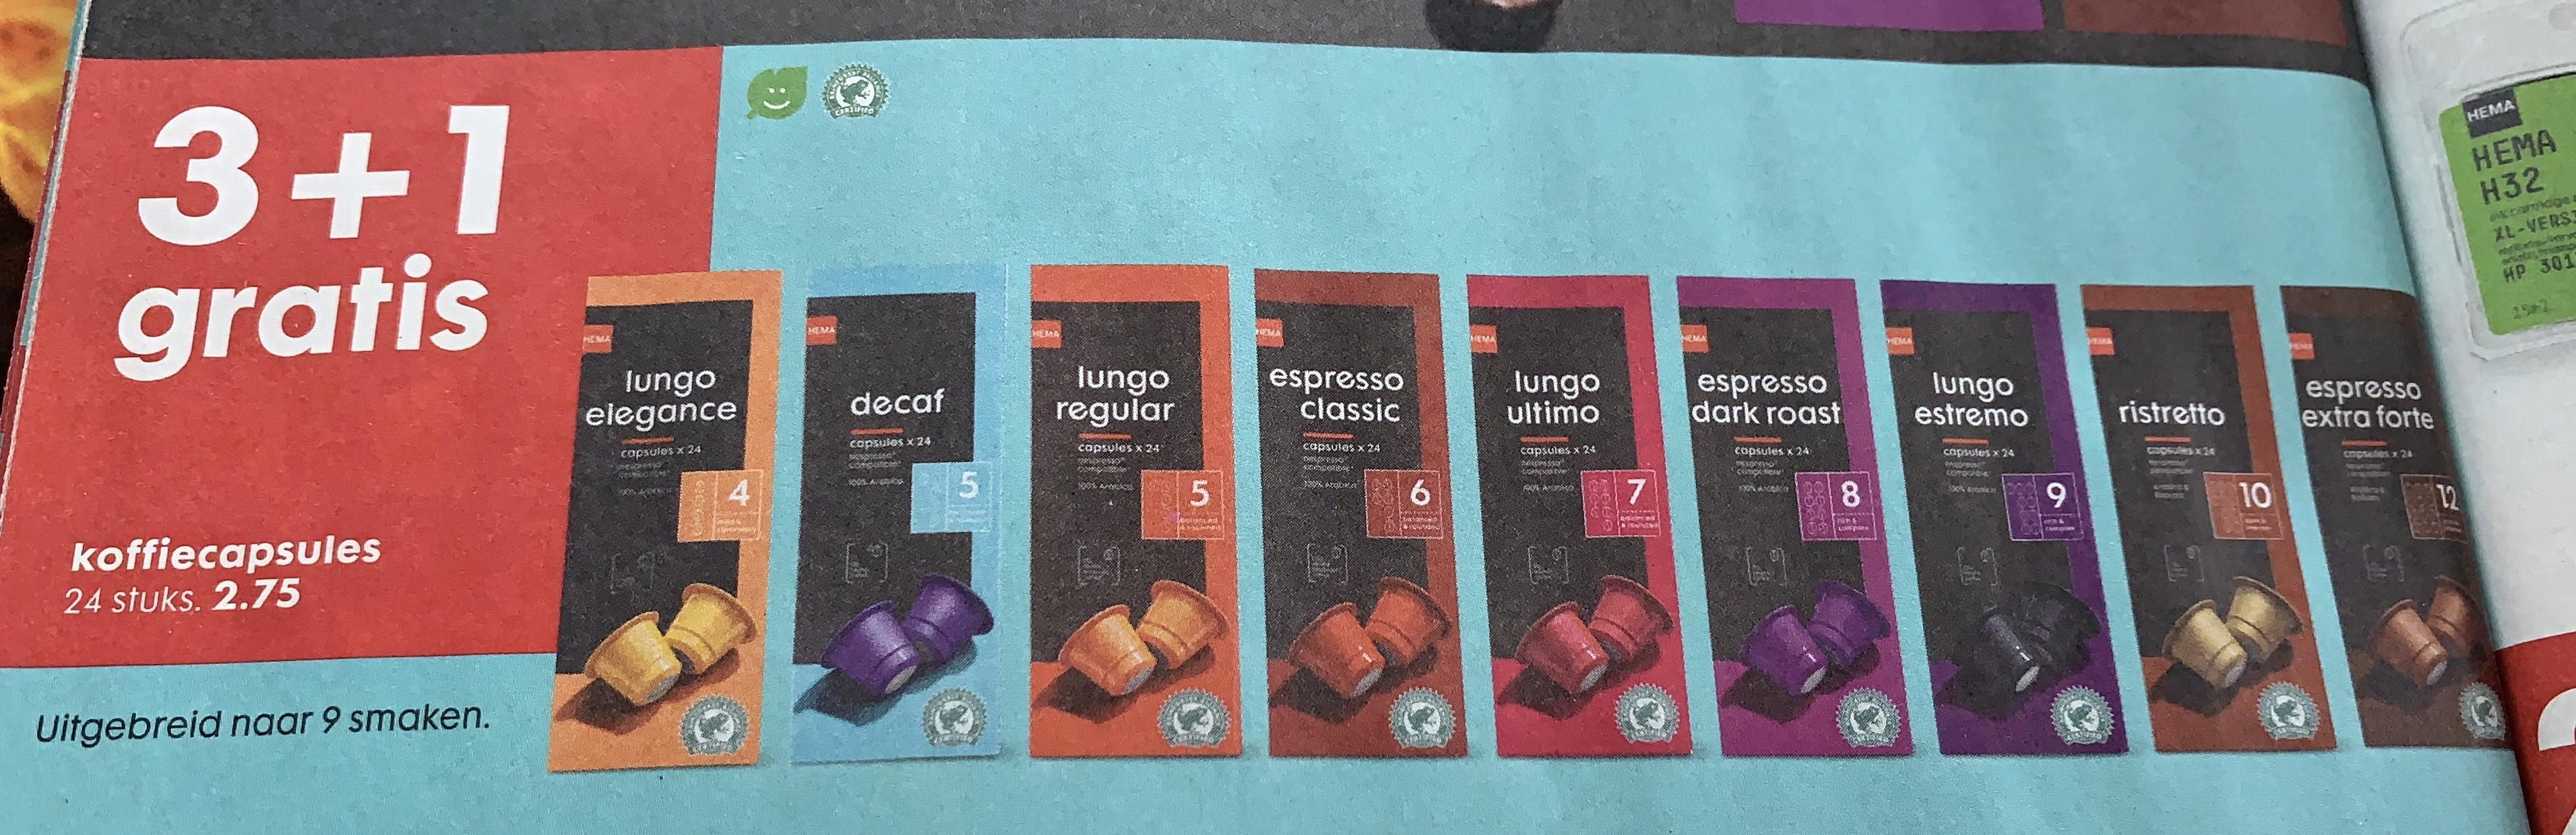 Koffiecapsules 3+1 gratis HEMA